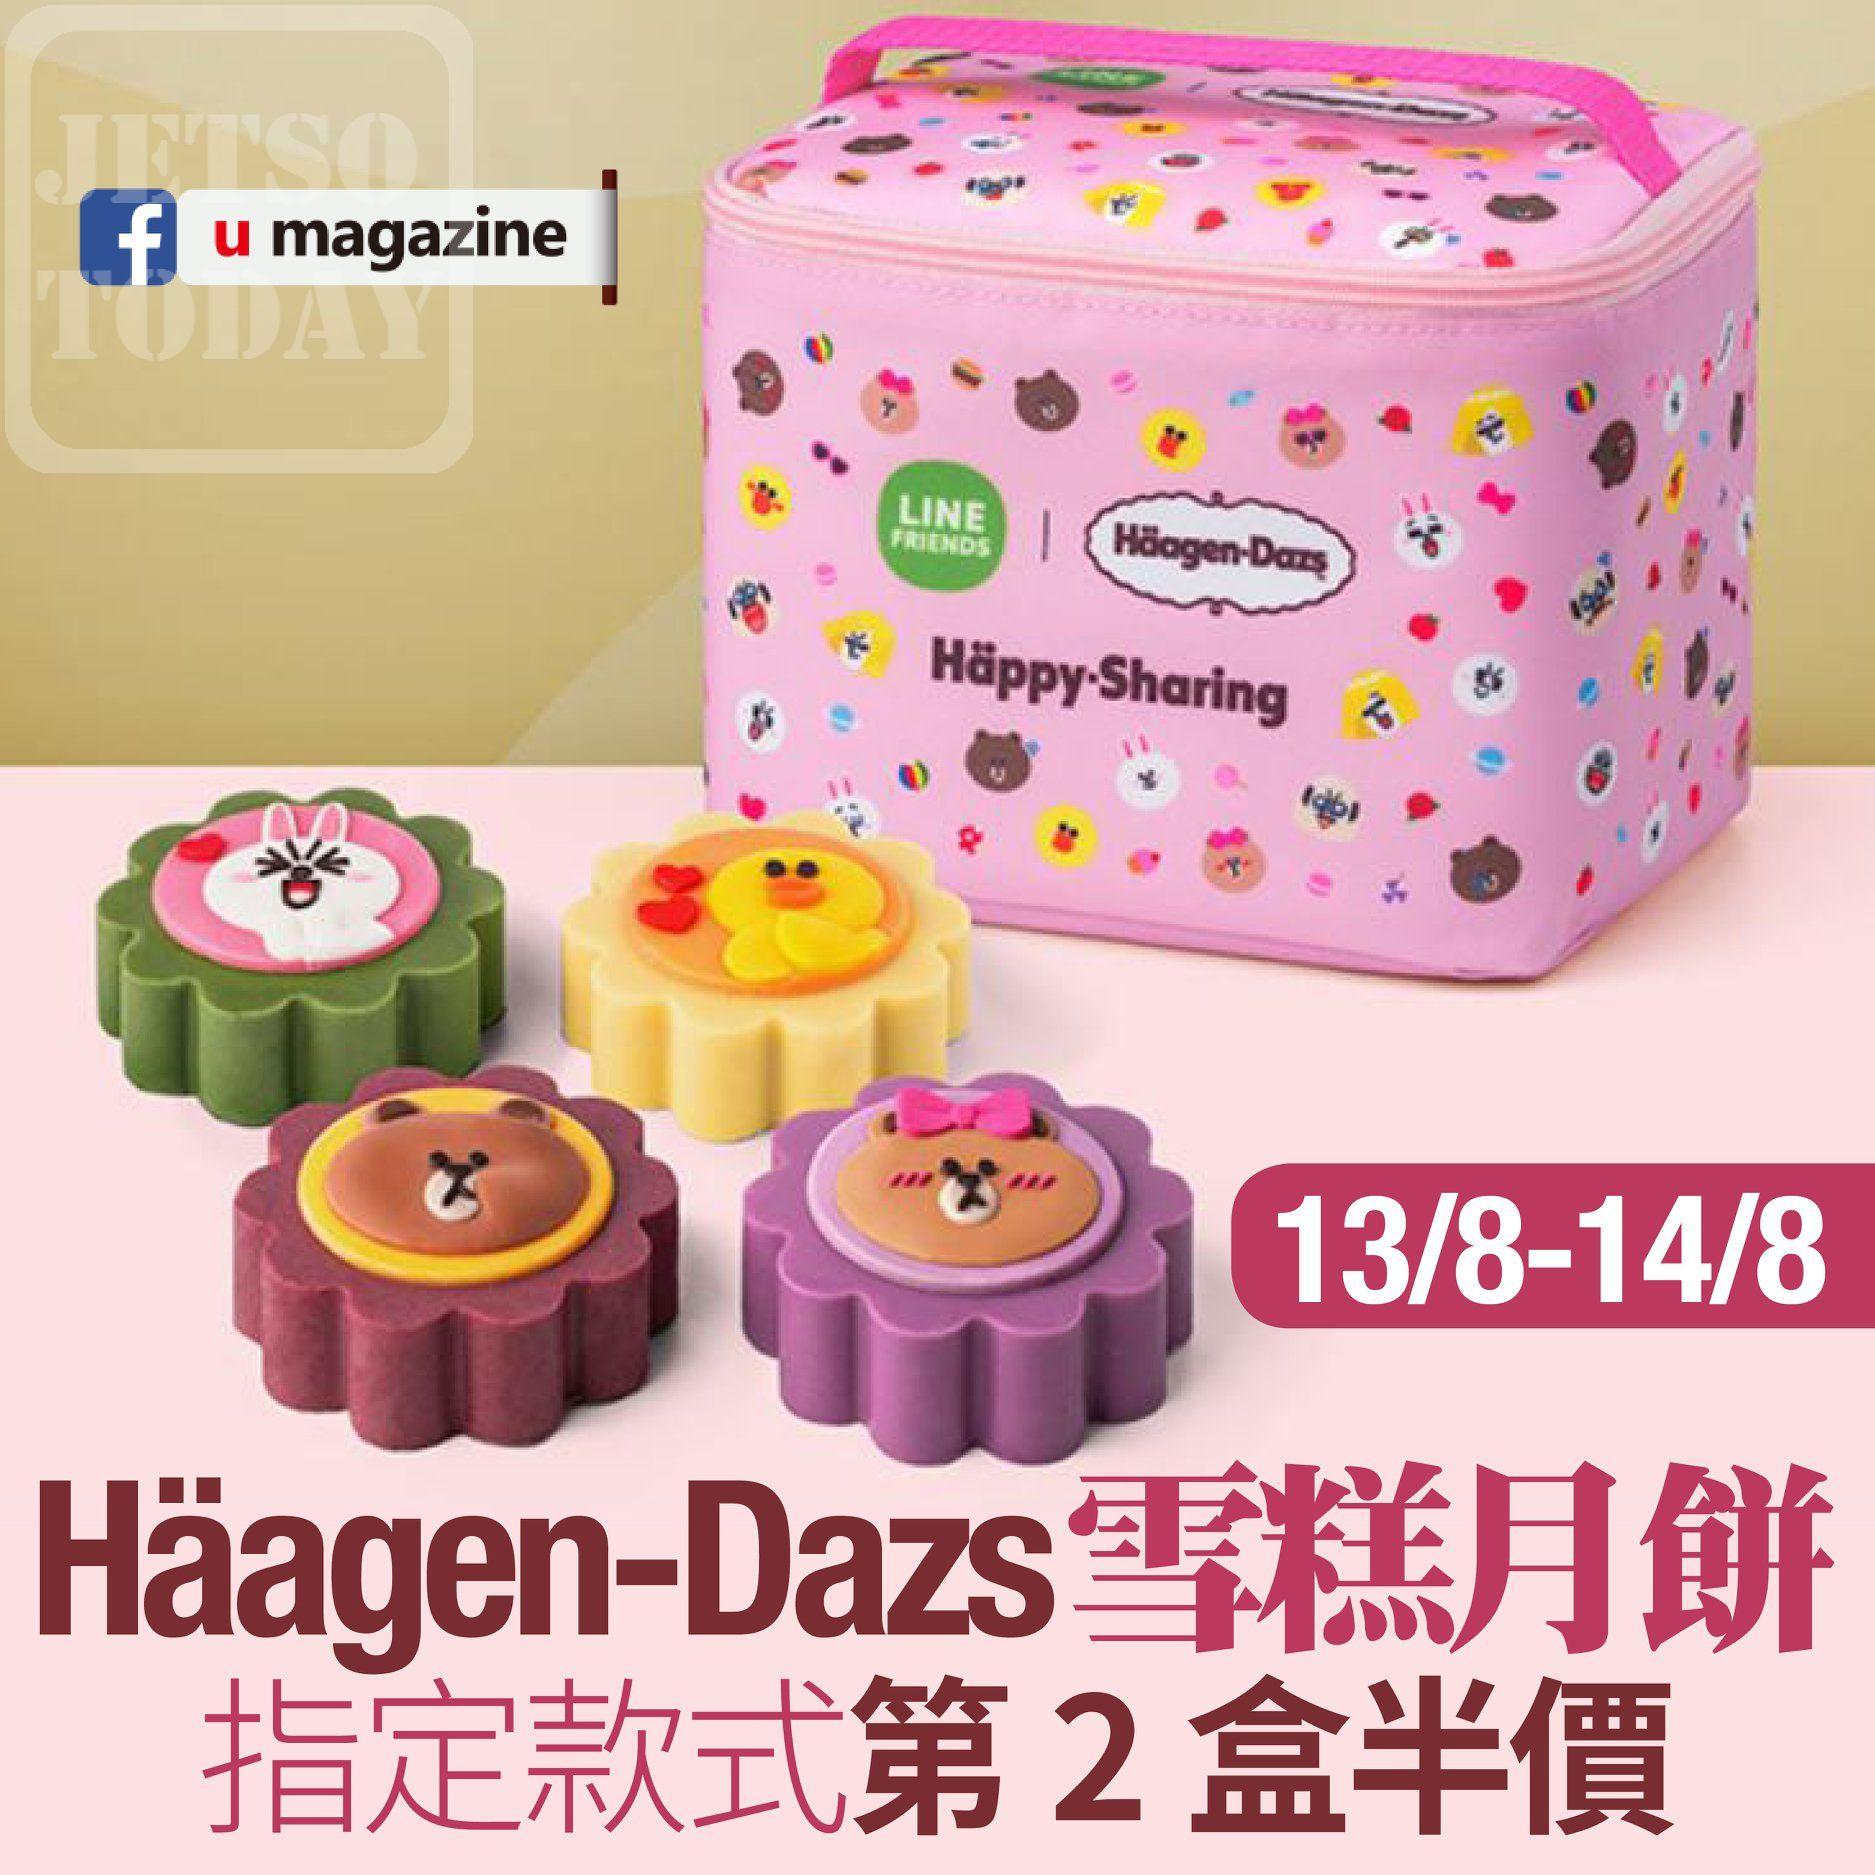 Haagen-dazs 快閃優惠 LINE 月餅 半價優惠 - Jetso Today